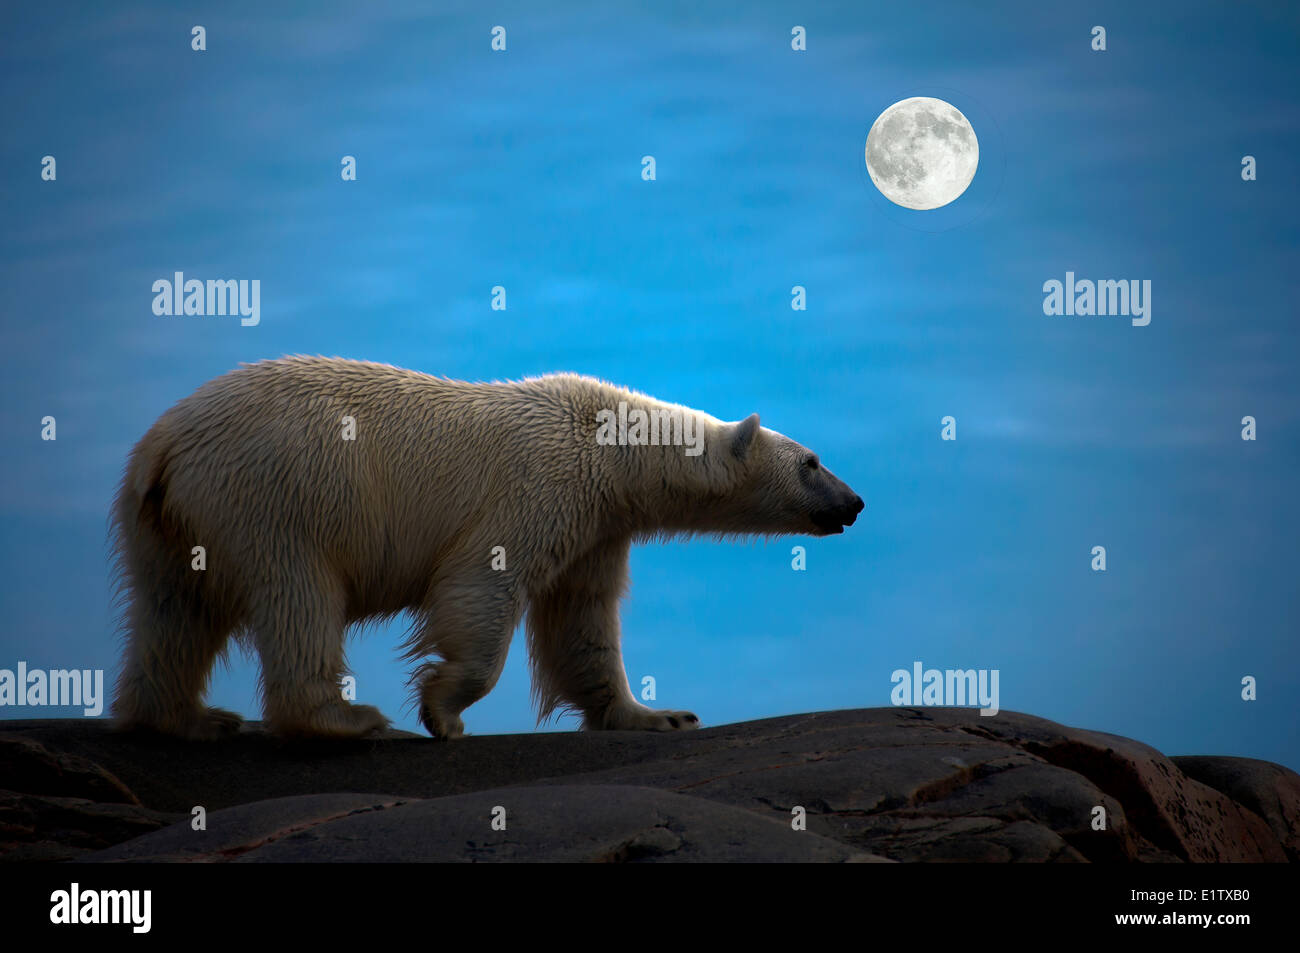 Landlocked polar bear (Ursus maritimus), Svalbard Archipelago, Norwegian Arctic - Stock Image